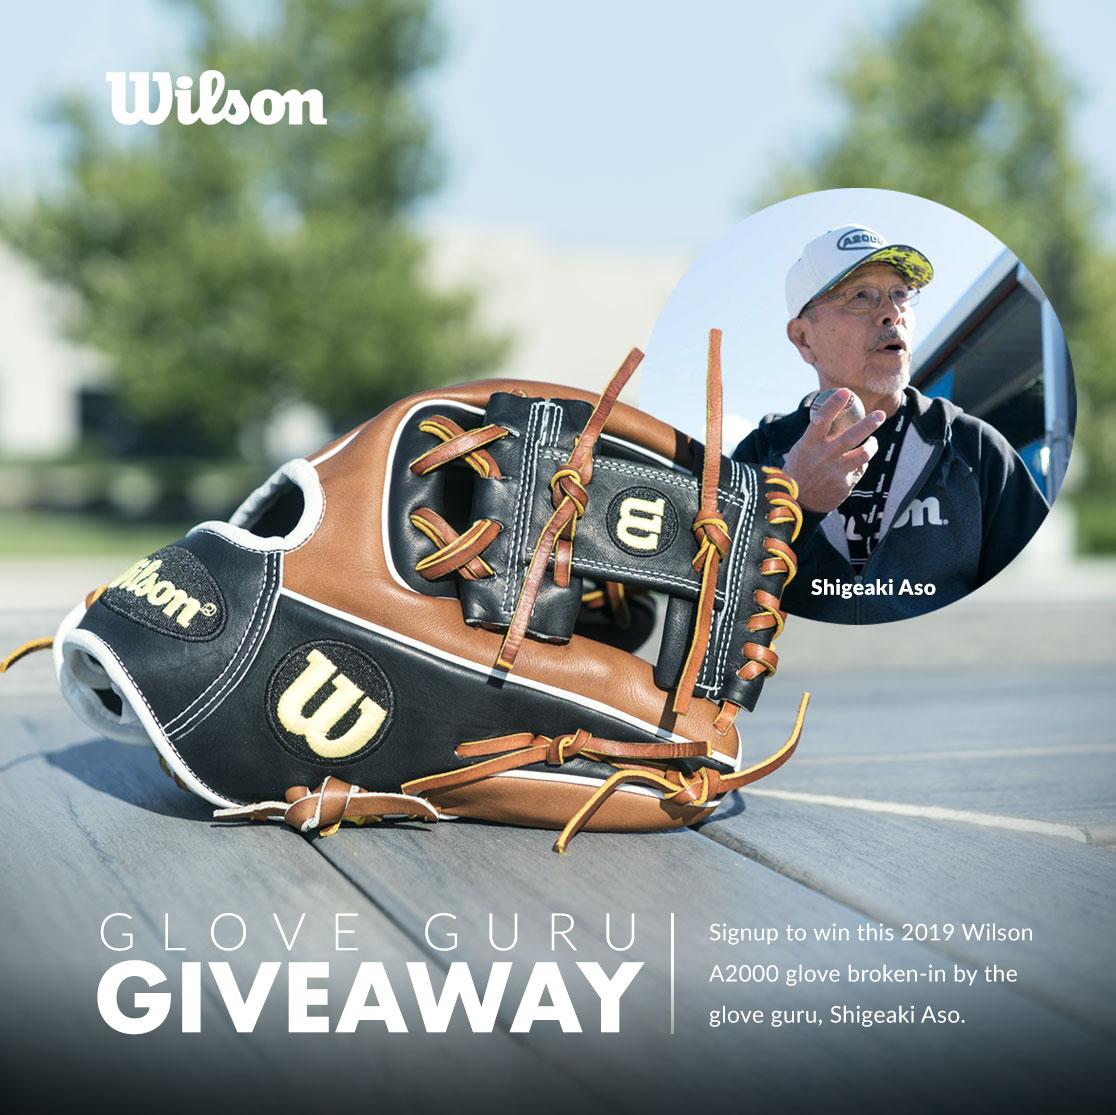 2019 Wilson A2000 Baseball Glove Contest